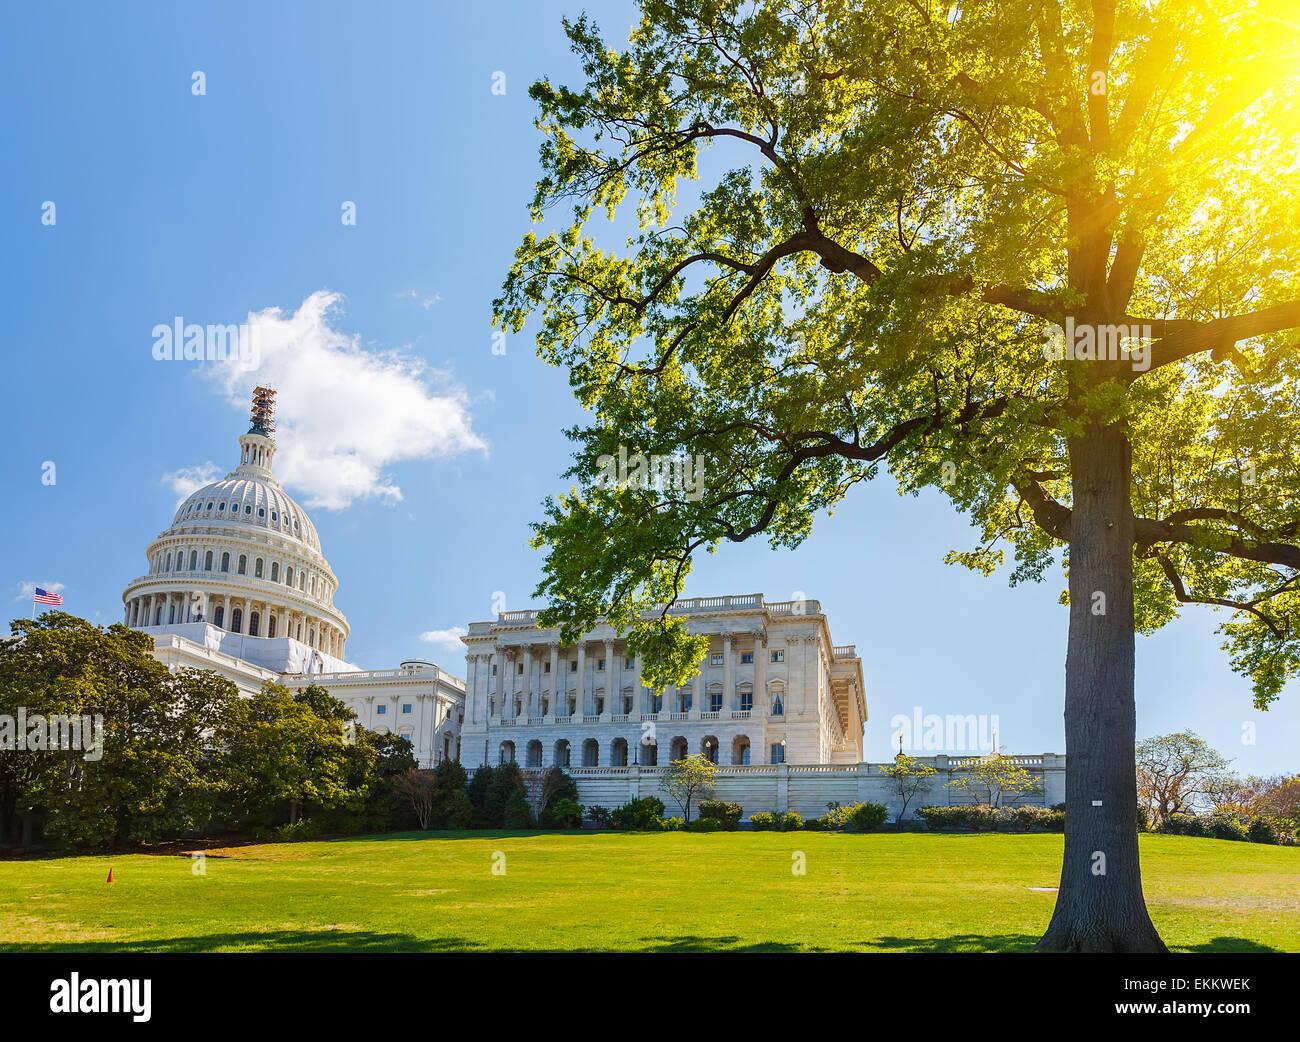 U.S. Capitol am sonnigen Tag Stockbild